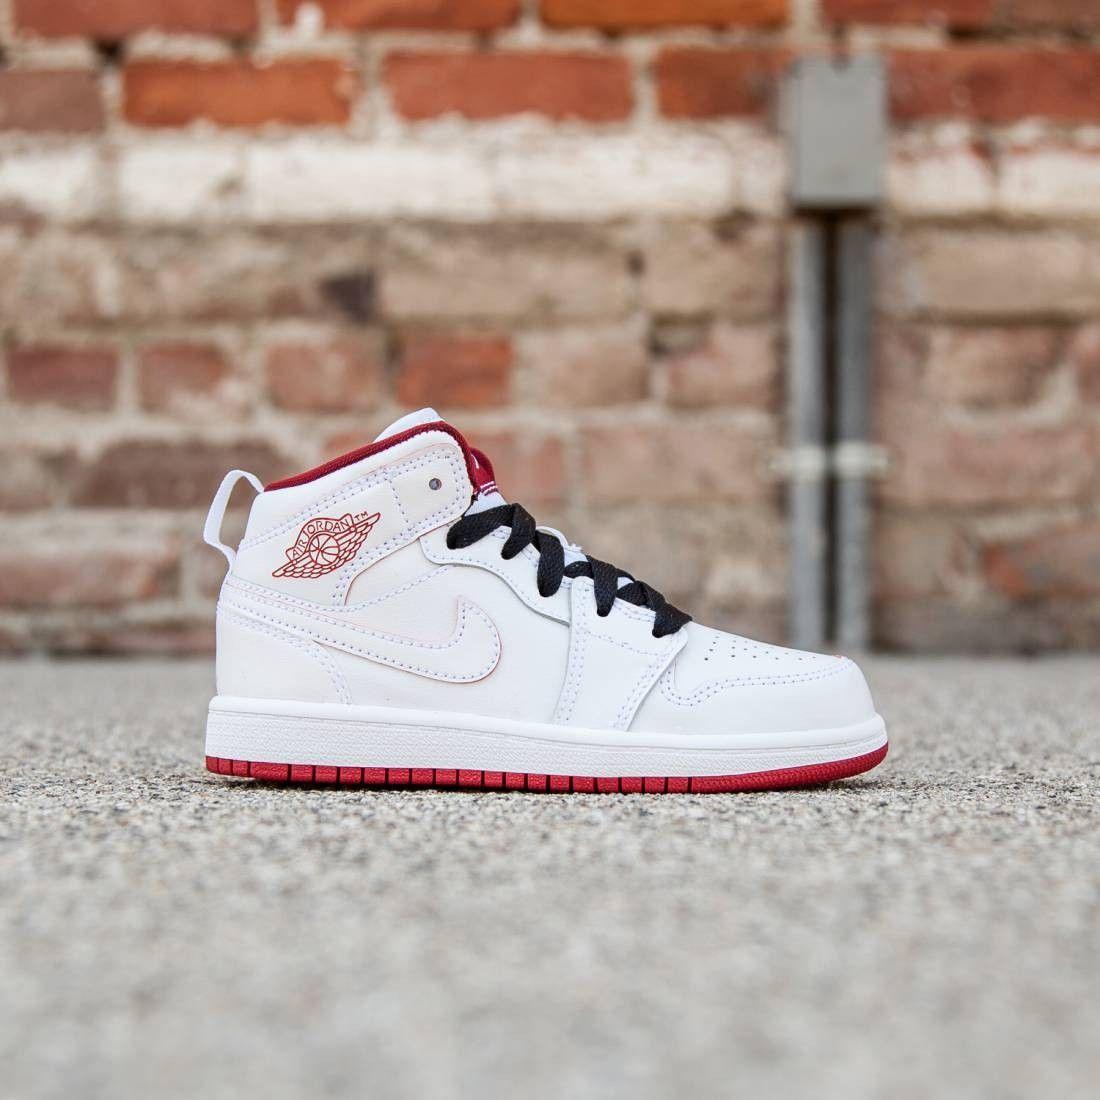 Air jordans, Kids' shoes, Nike wear